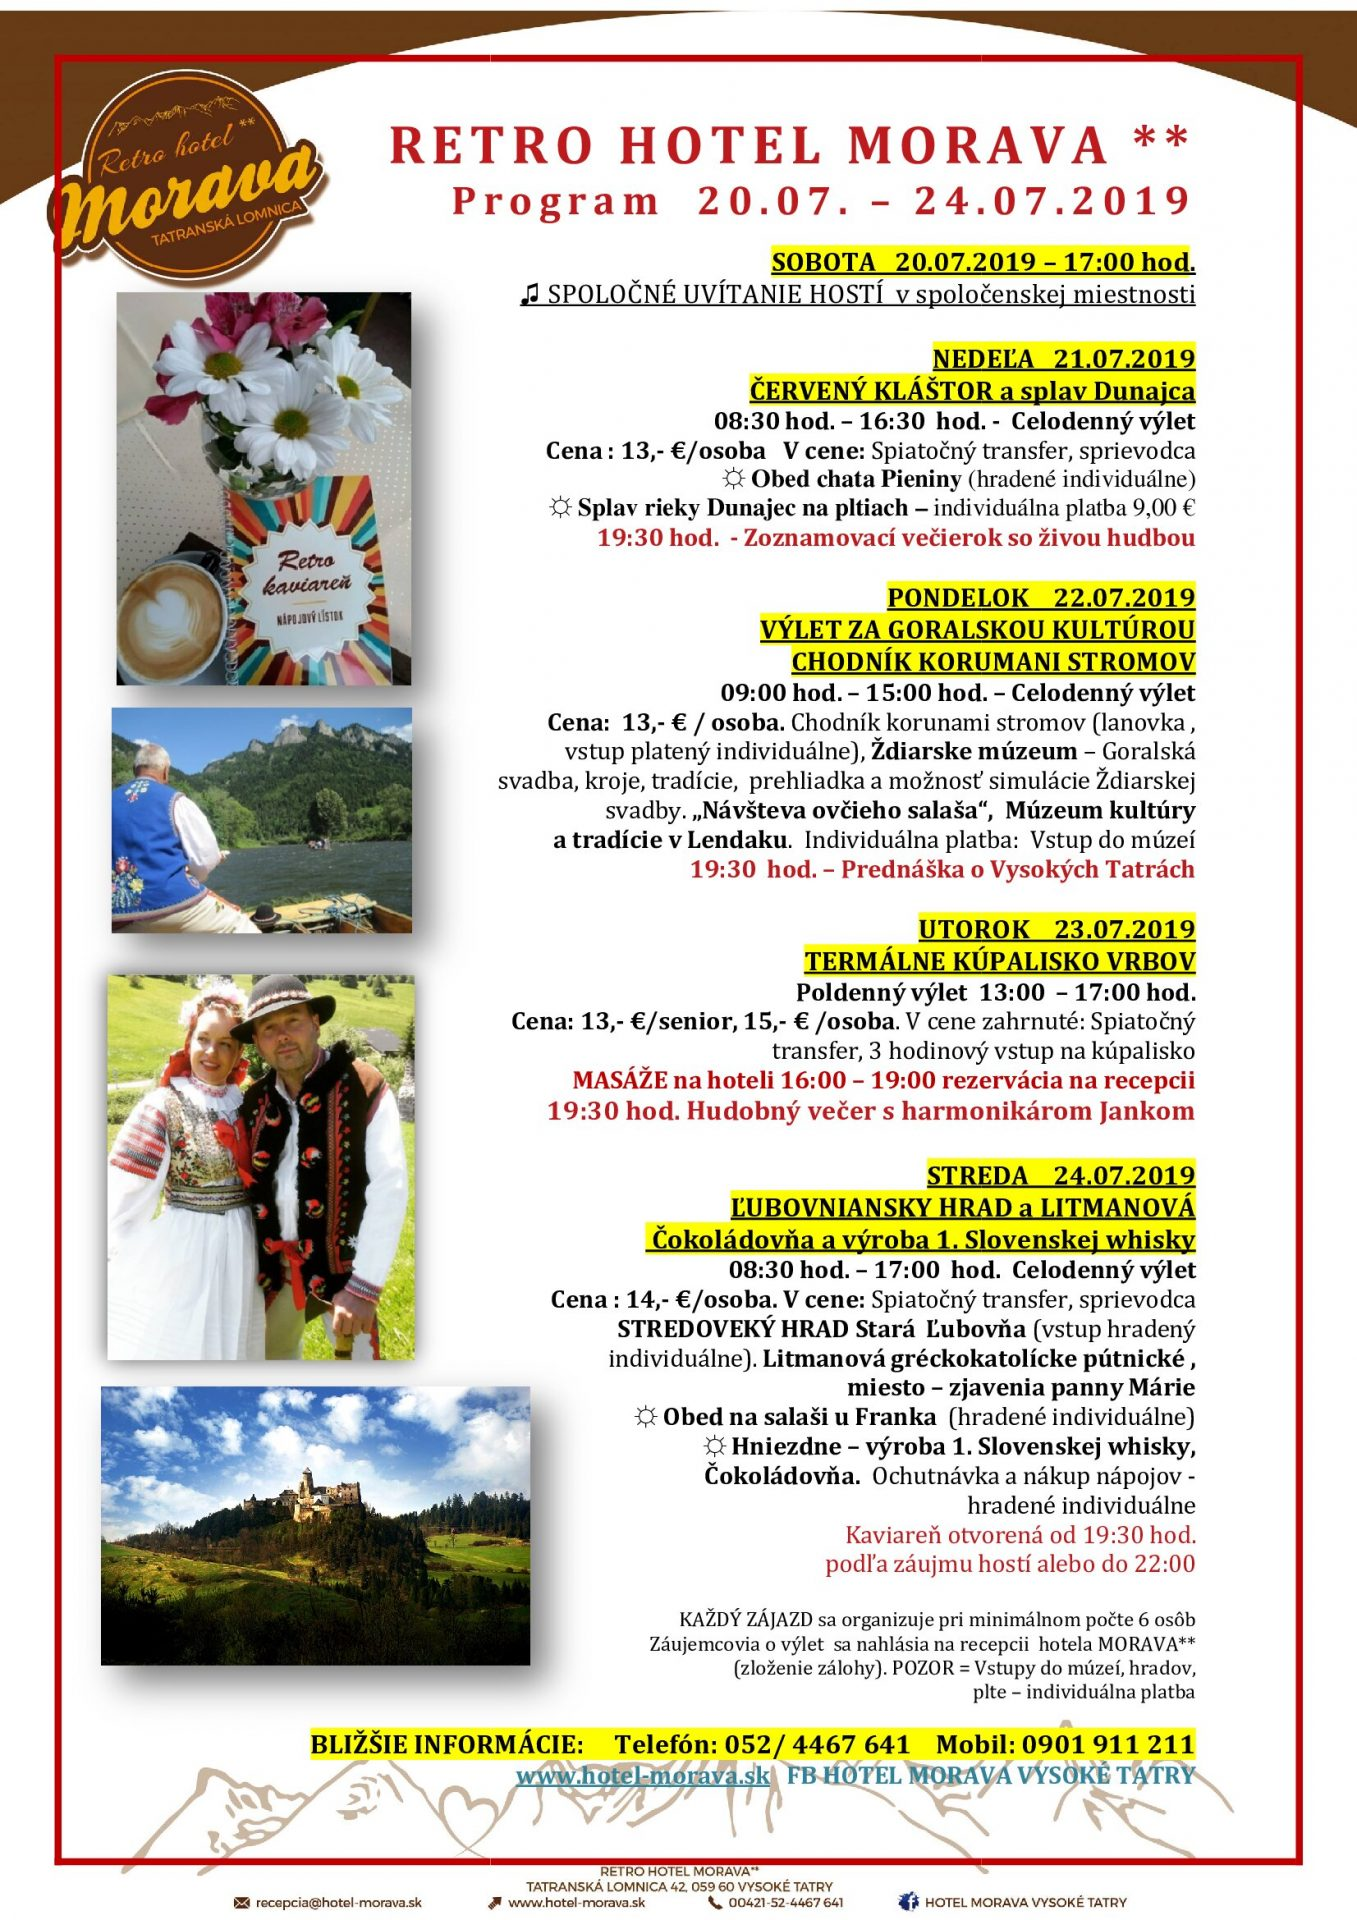 Program Retro Hotela Morava 20.7.-24.7.2019